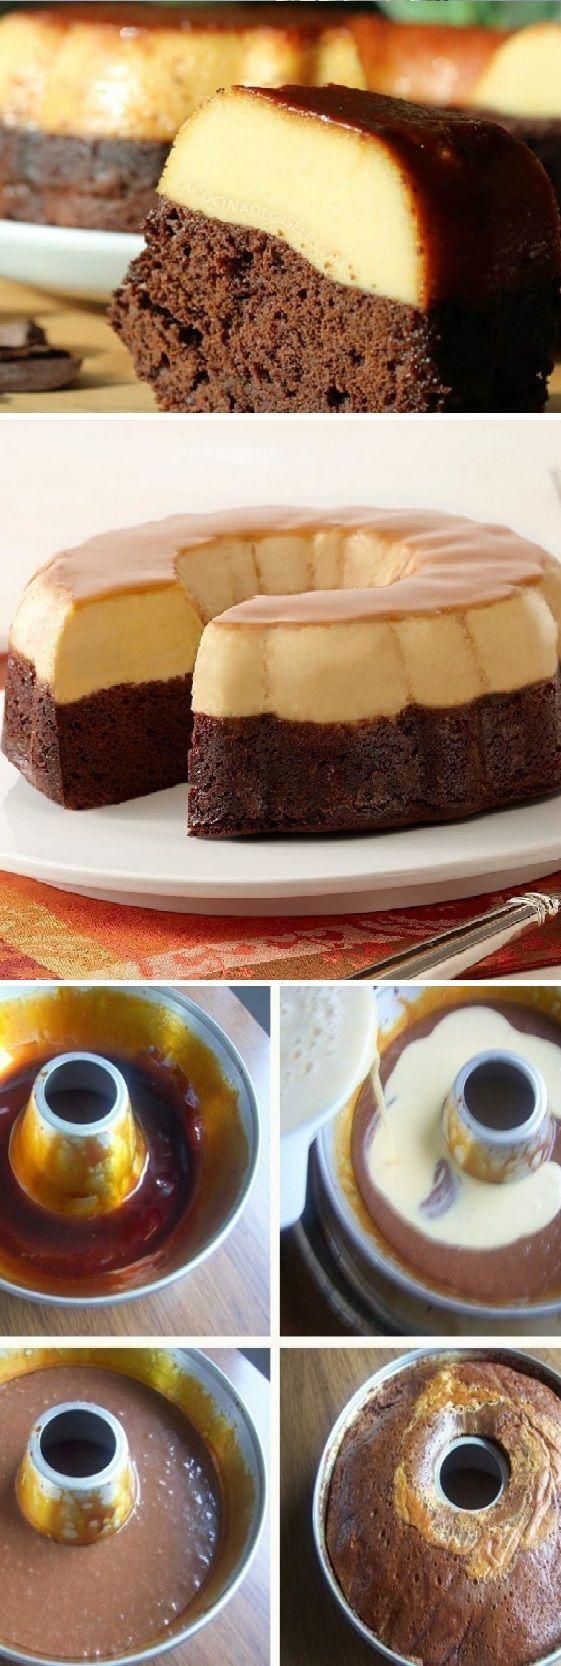 "Cómo preparar chocoflán o ""pastel imposible""  Pinterest | https://pinterest.com/elcocin"